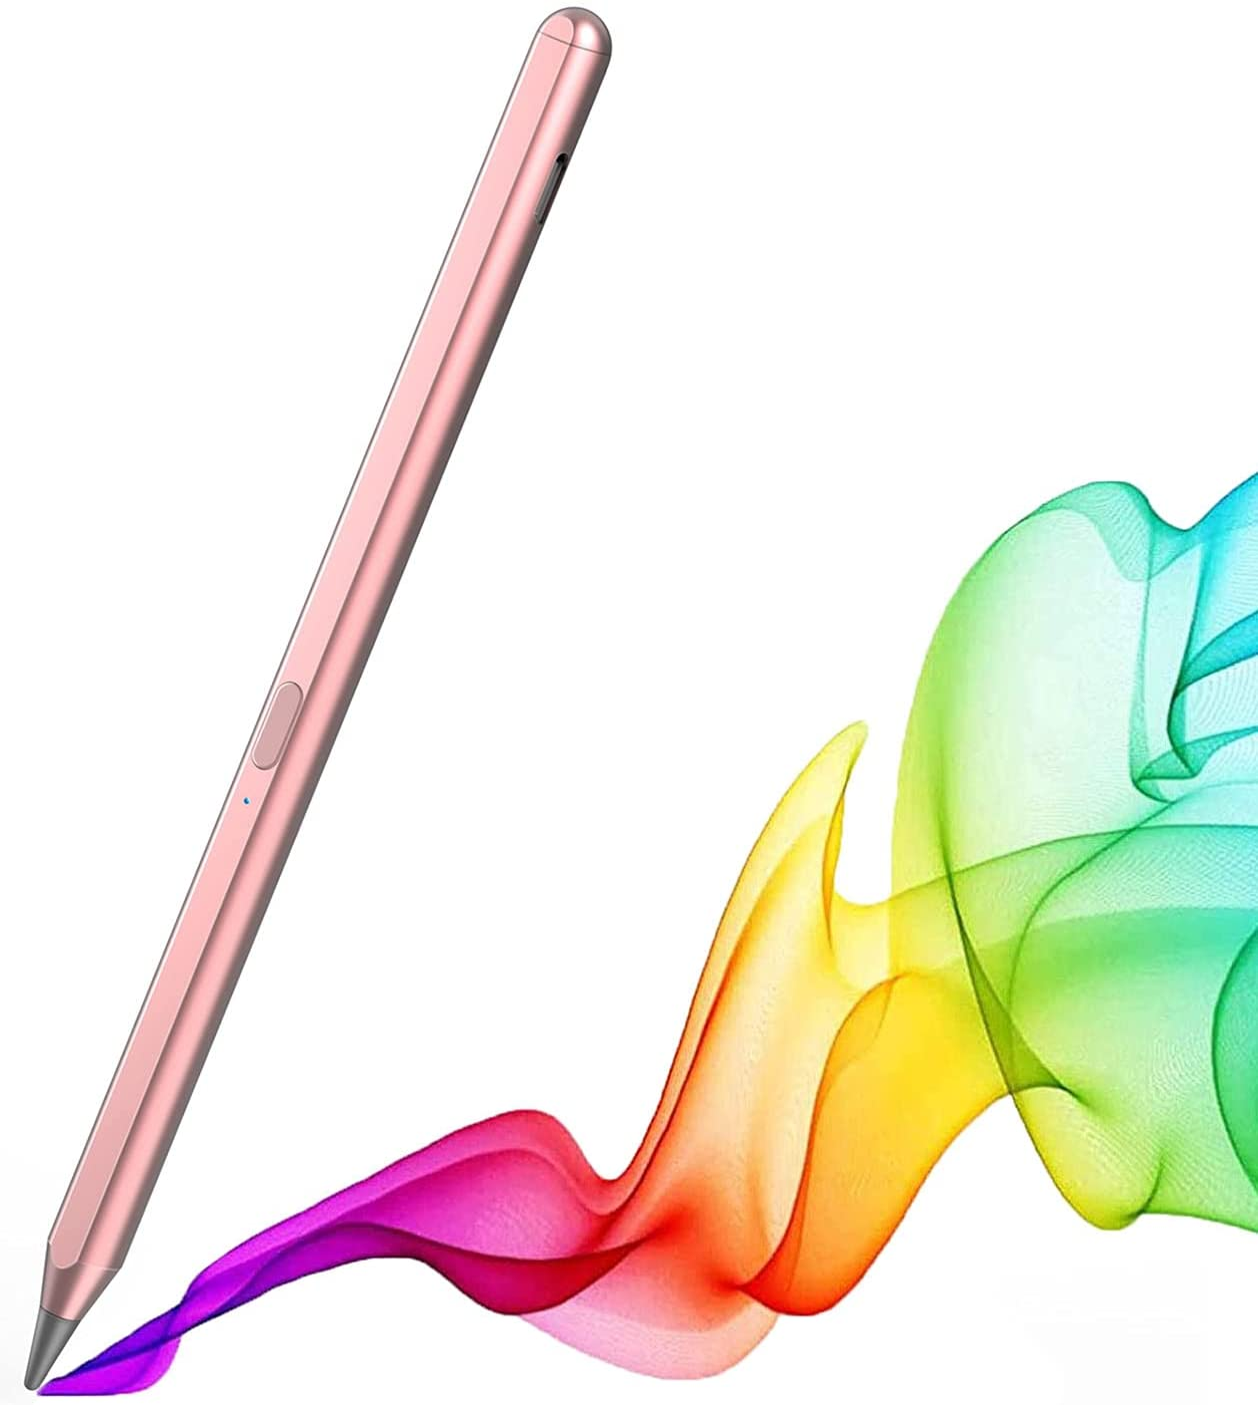 Stylus Pen for Apple iPad Pro Pencil 5th Generation 12.9/11 2021, iPad Air 4th &3rd Generation, iPad Pro 4th &3rd, iPad 8th, iPad 7th, iPad 6th, Compatible with 2018-2021 Apple iPads [Tilt Creative]